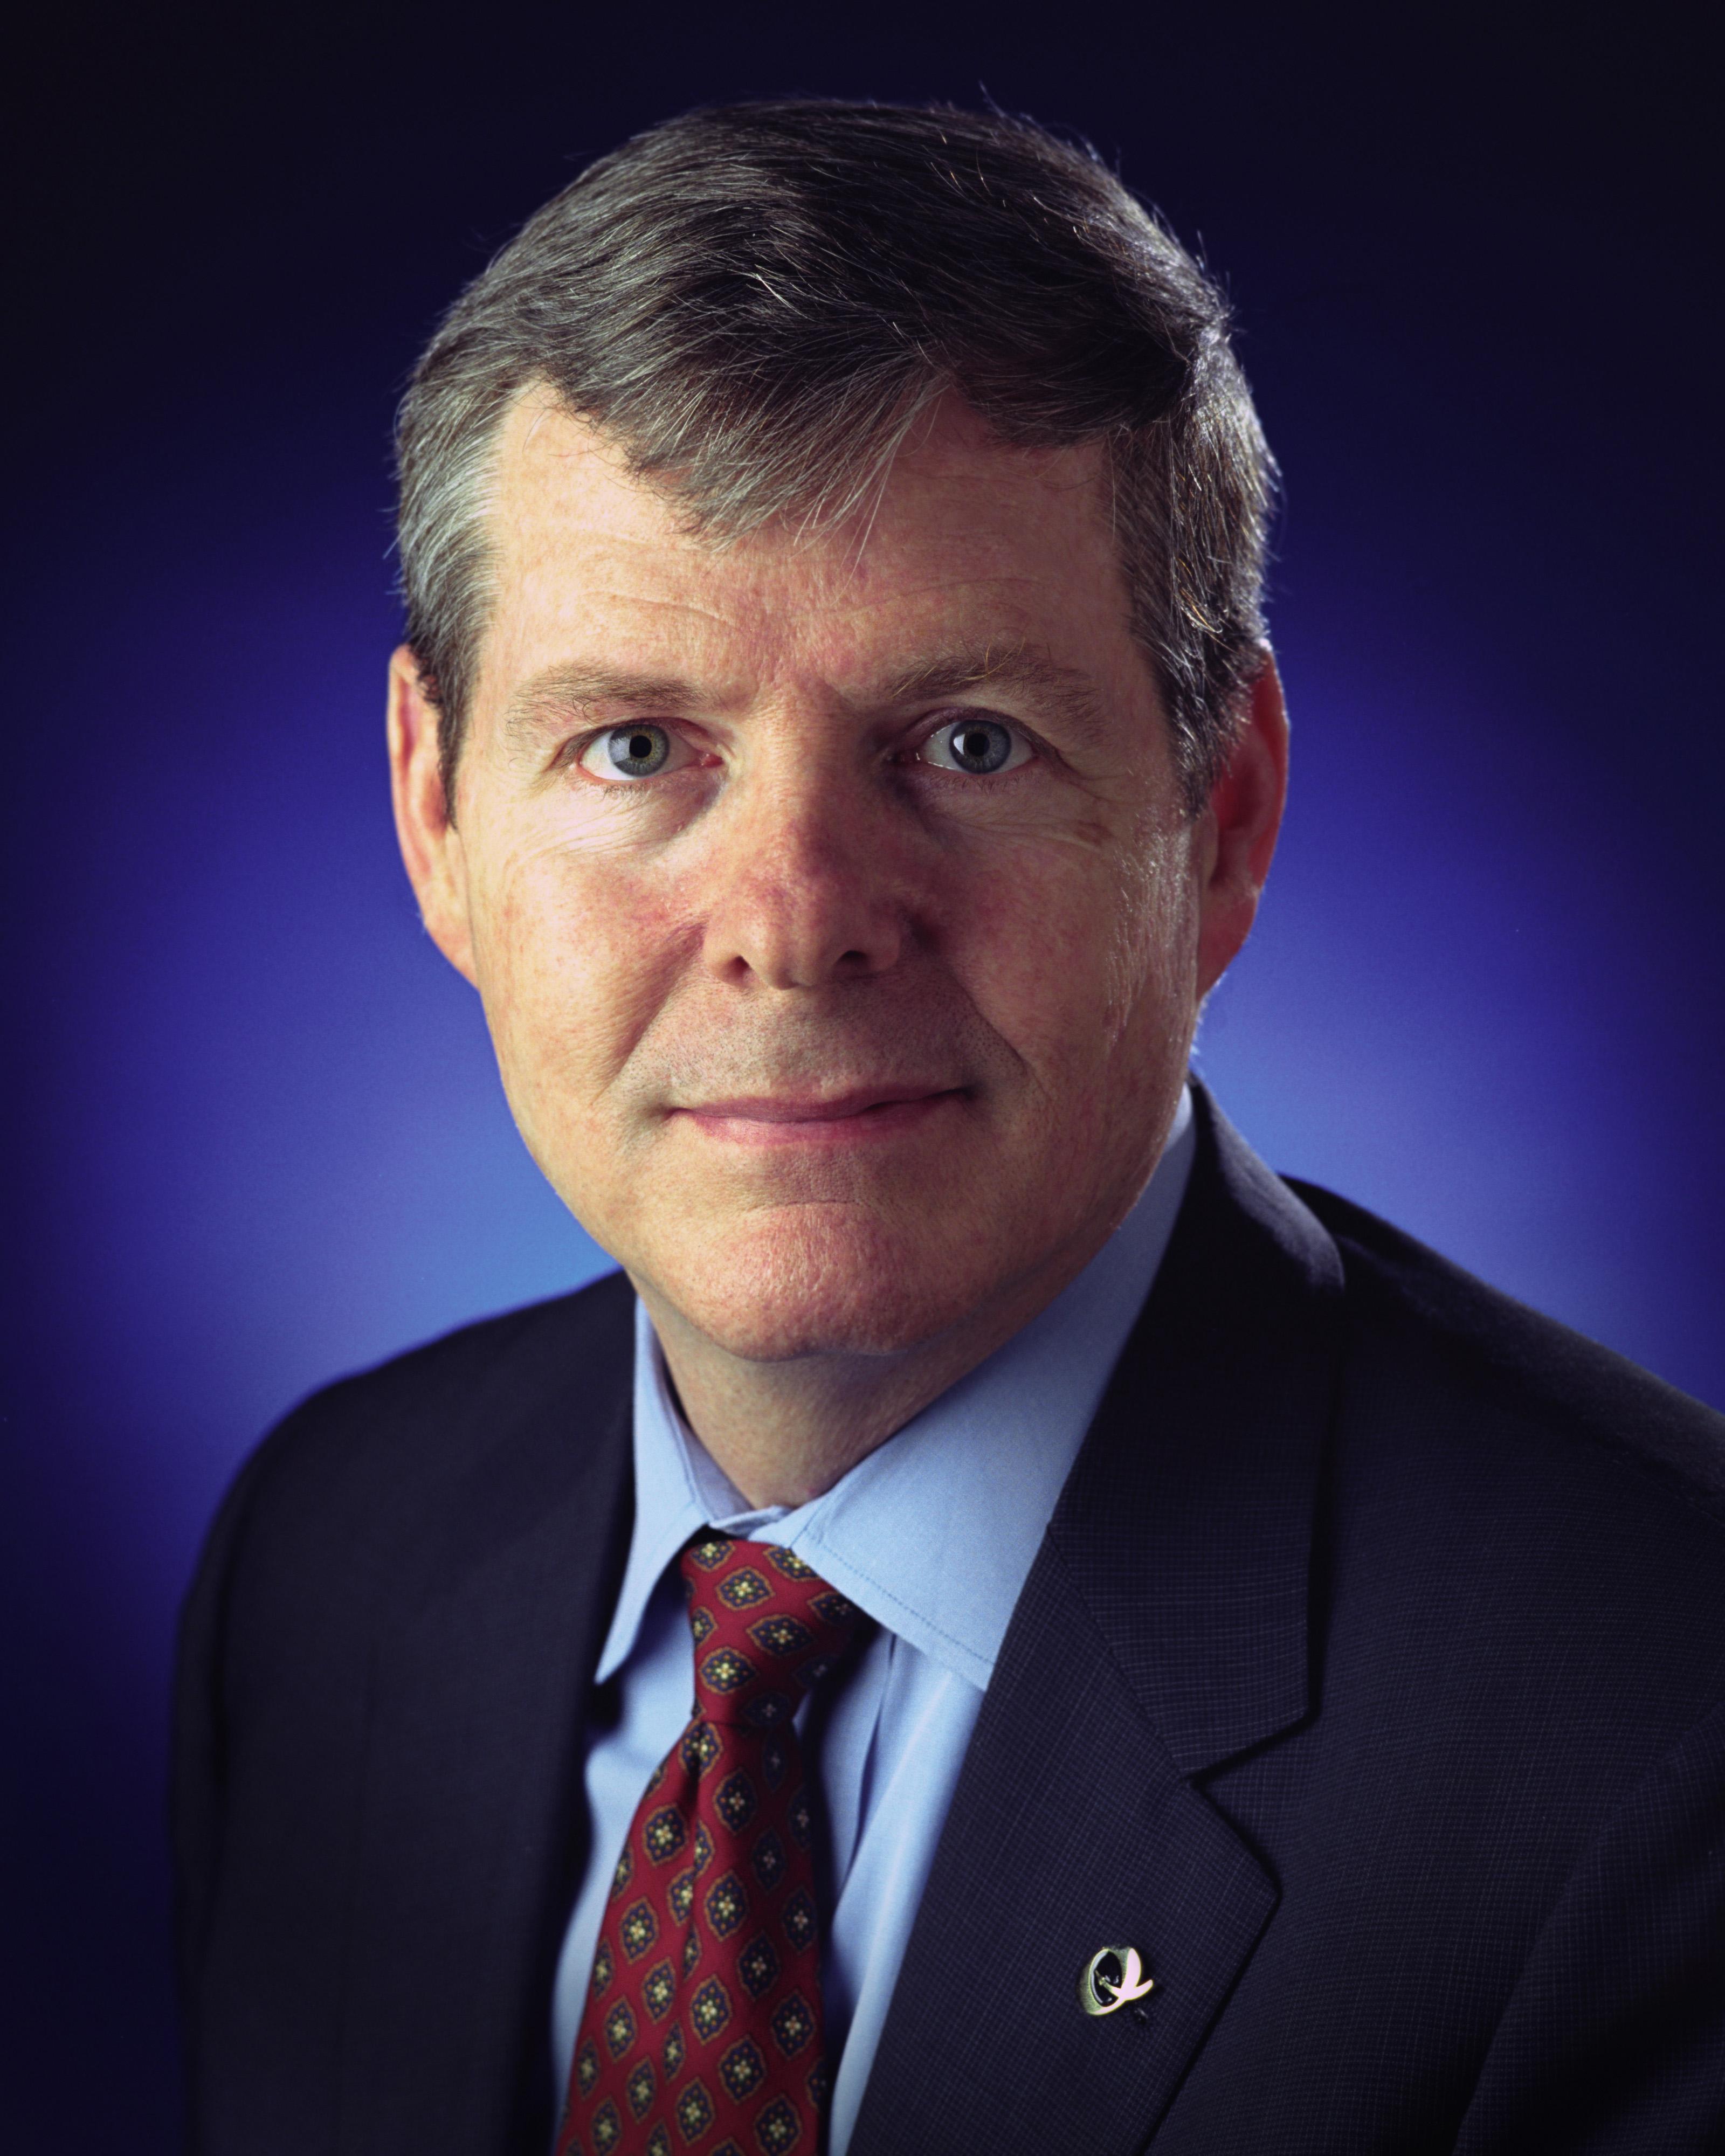 Bryan O'Connor